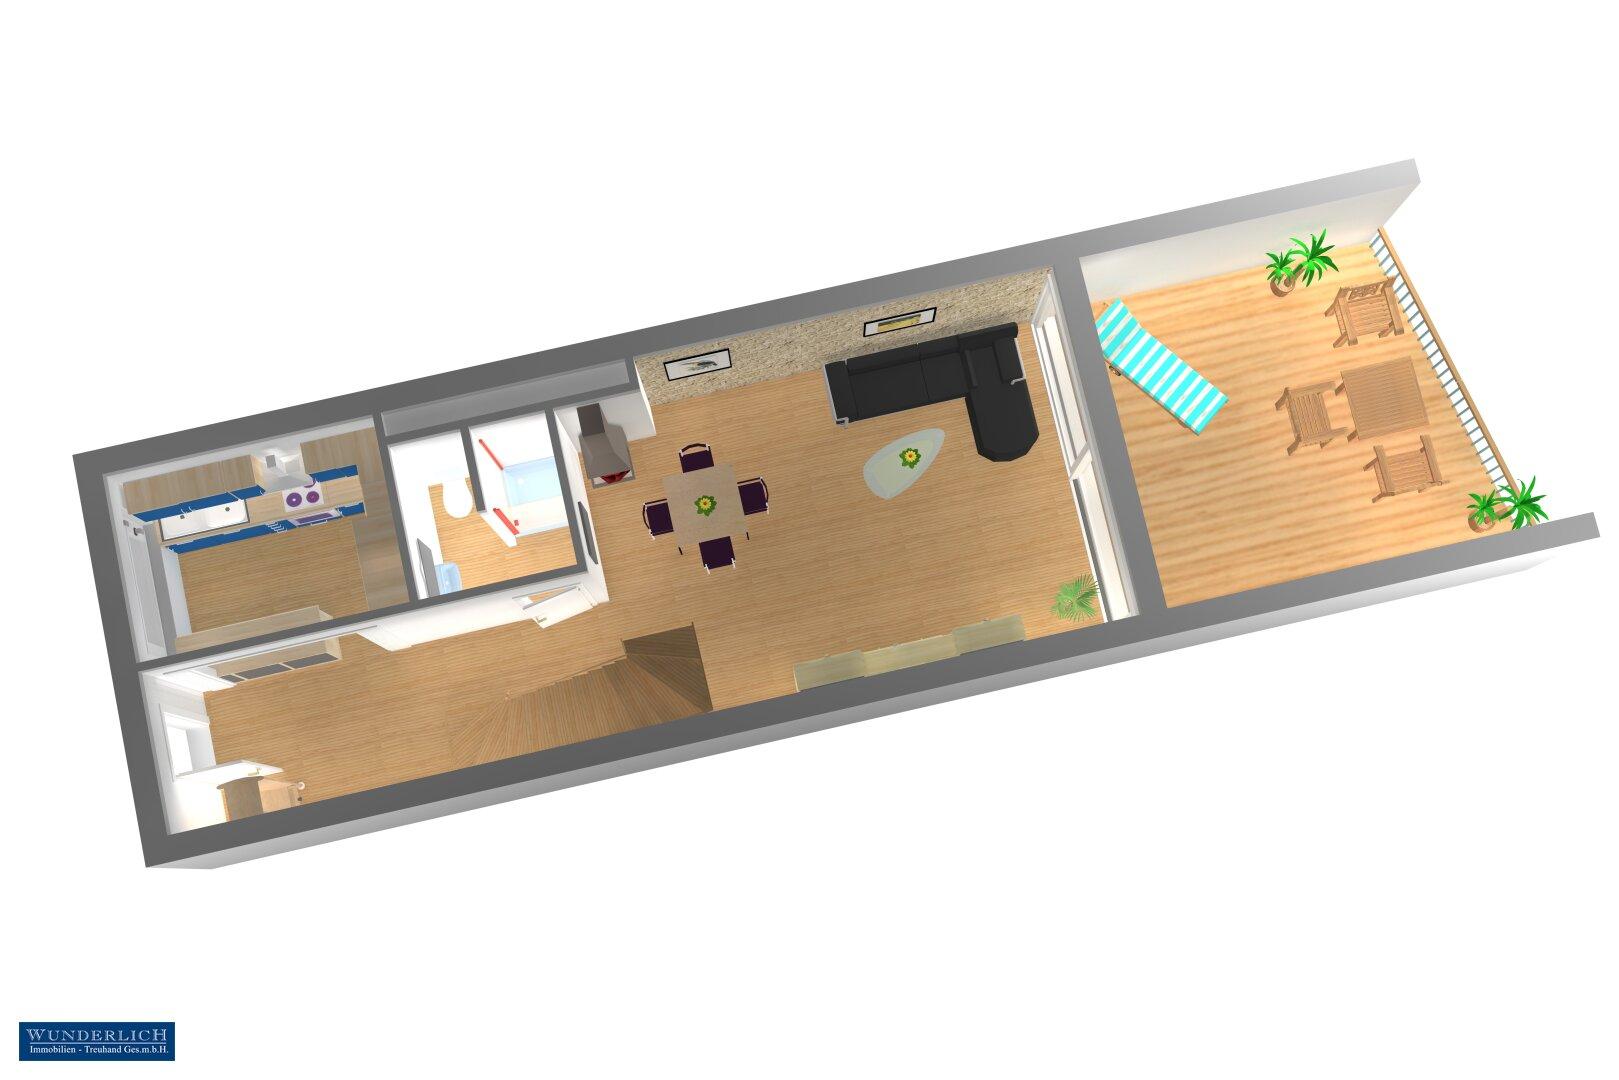 Eingsangsebene 3D-Visualisierung 1